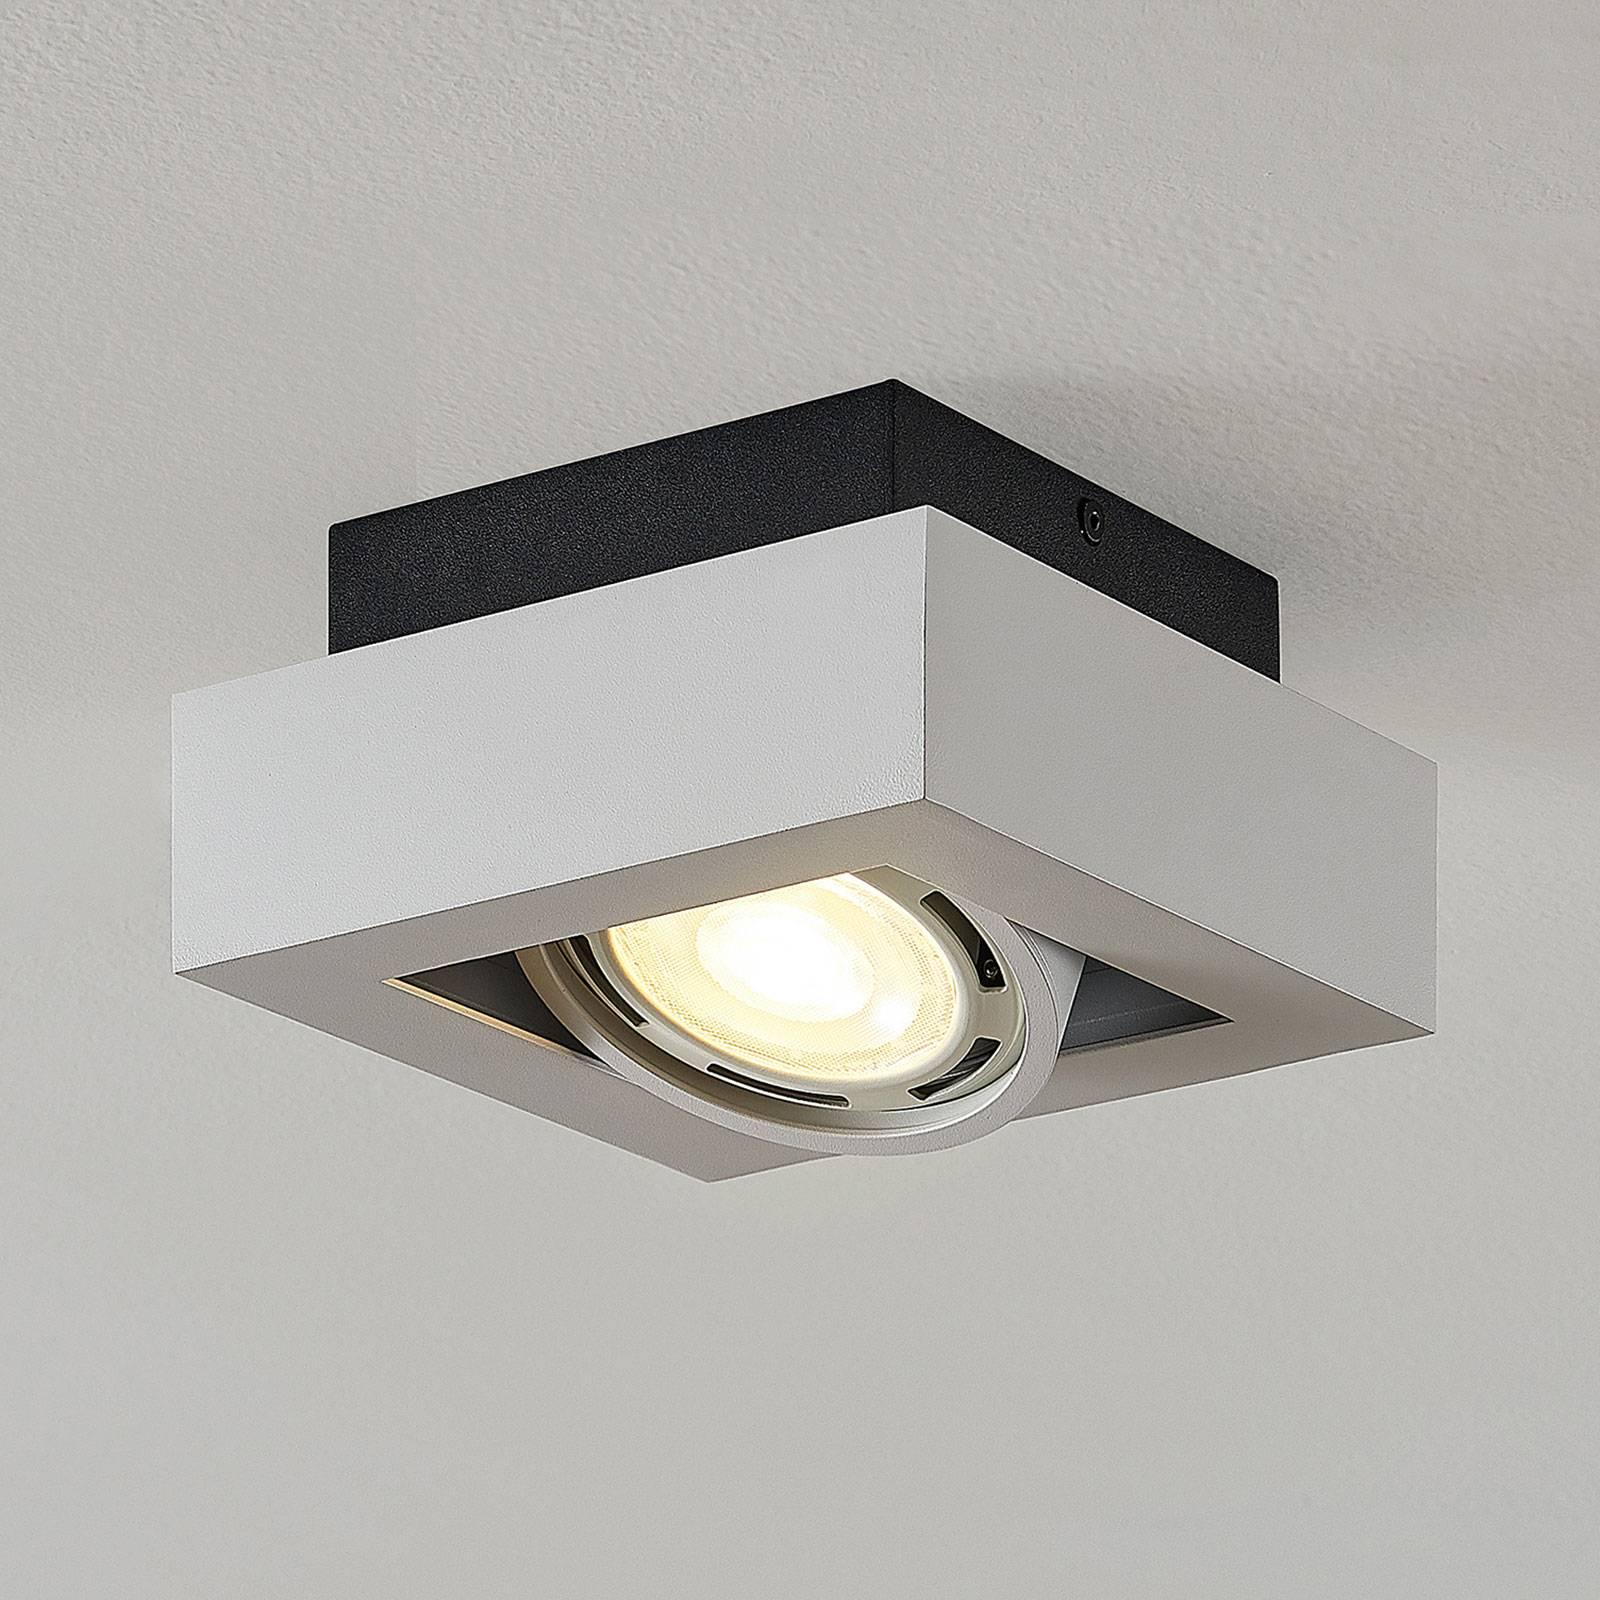 LED-Deckenstrahler Ronka, GU10, 1-fl., weiß